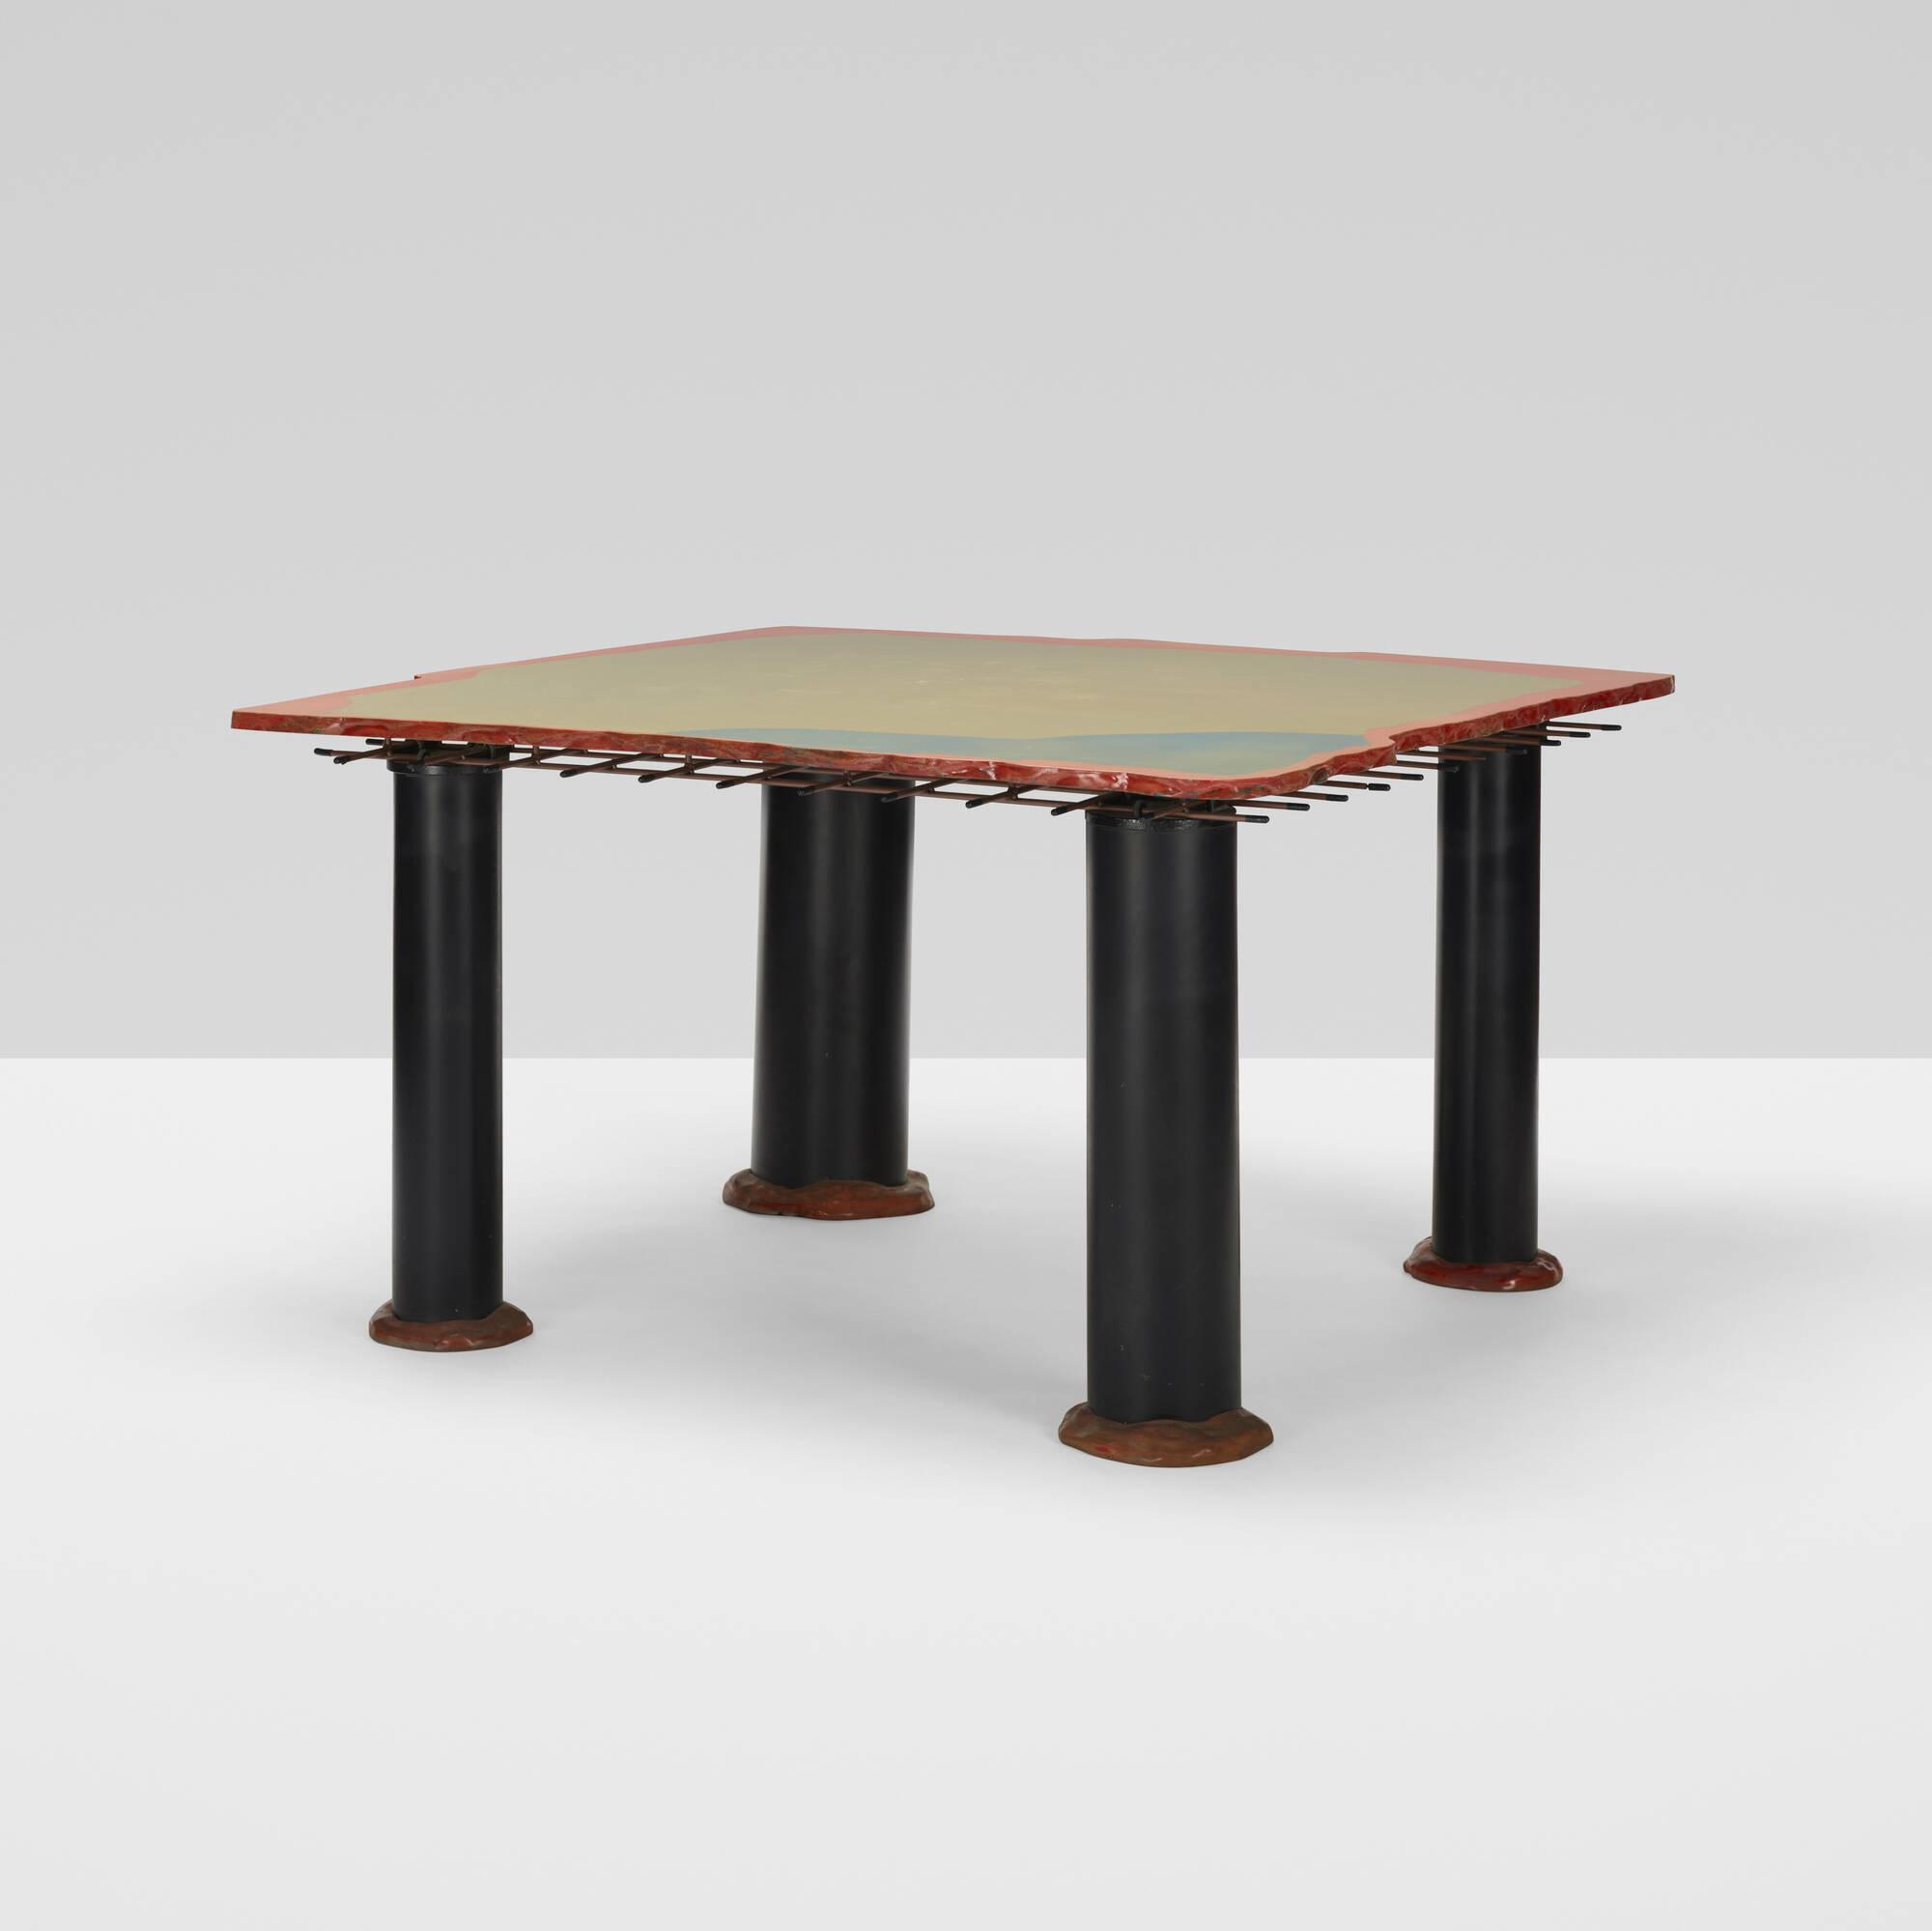 292: Gaetano Pesce / Sansone II dining table (2 of 3)